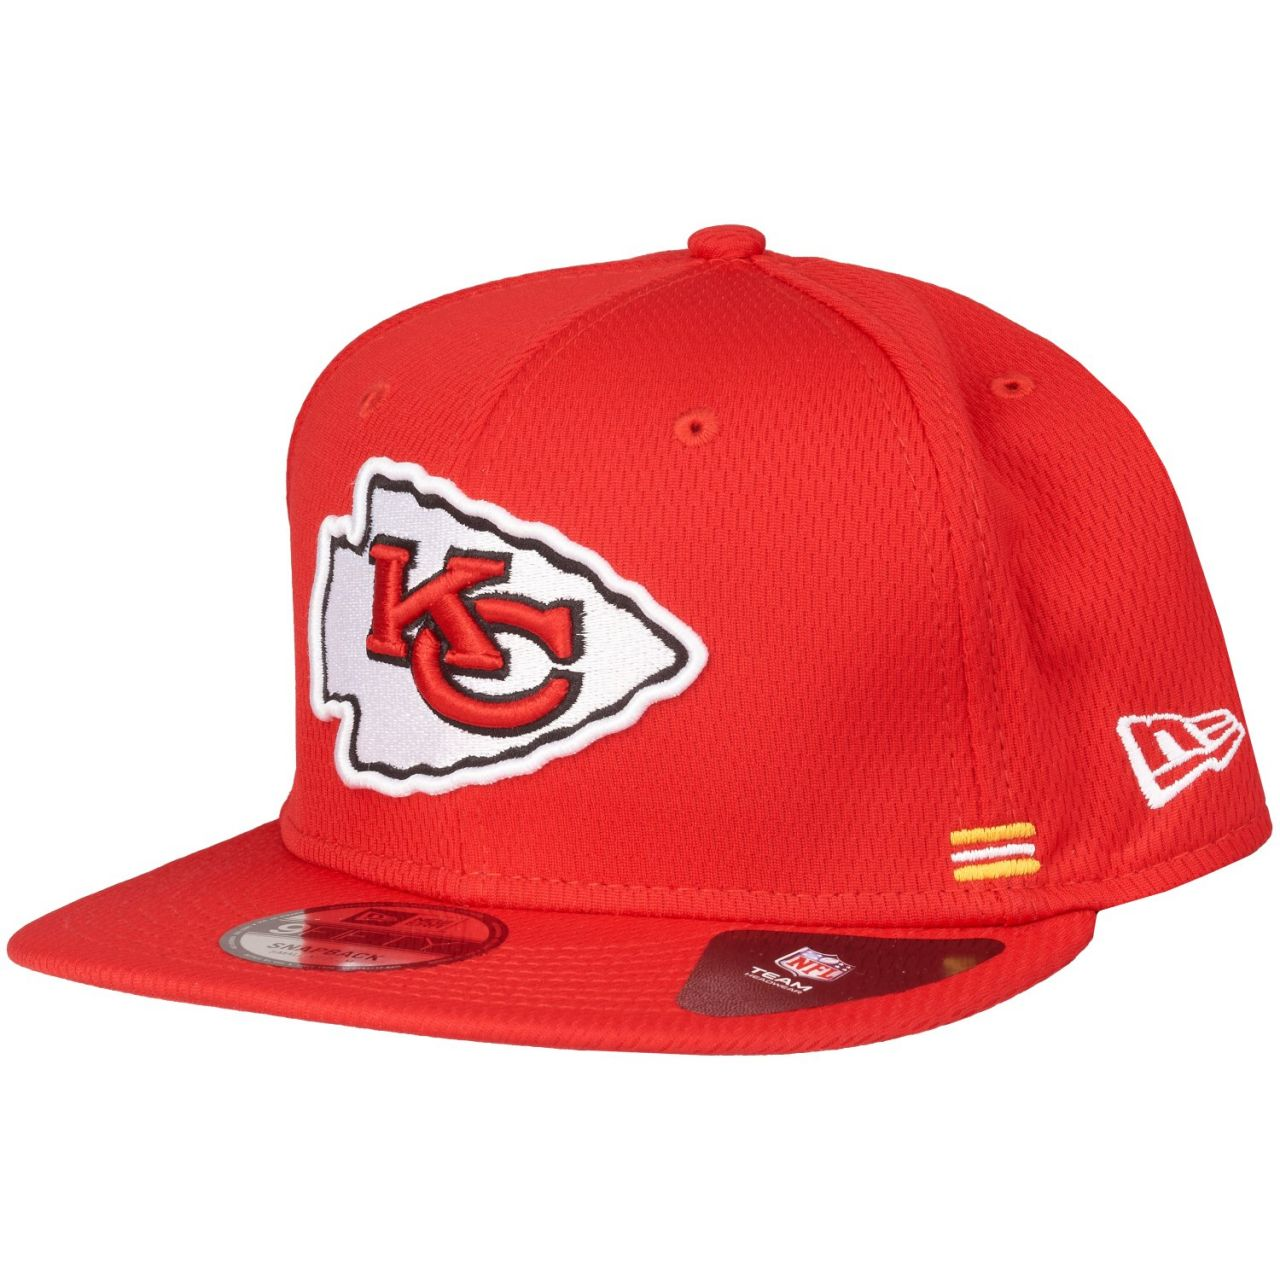 amfoo - New Era 9FIFTY Snapback Cap - HOMETOWN Kansas City Chiefs